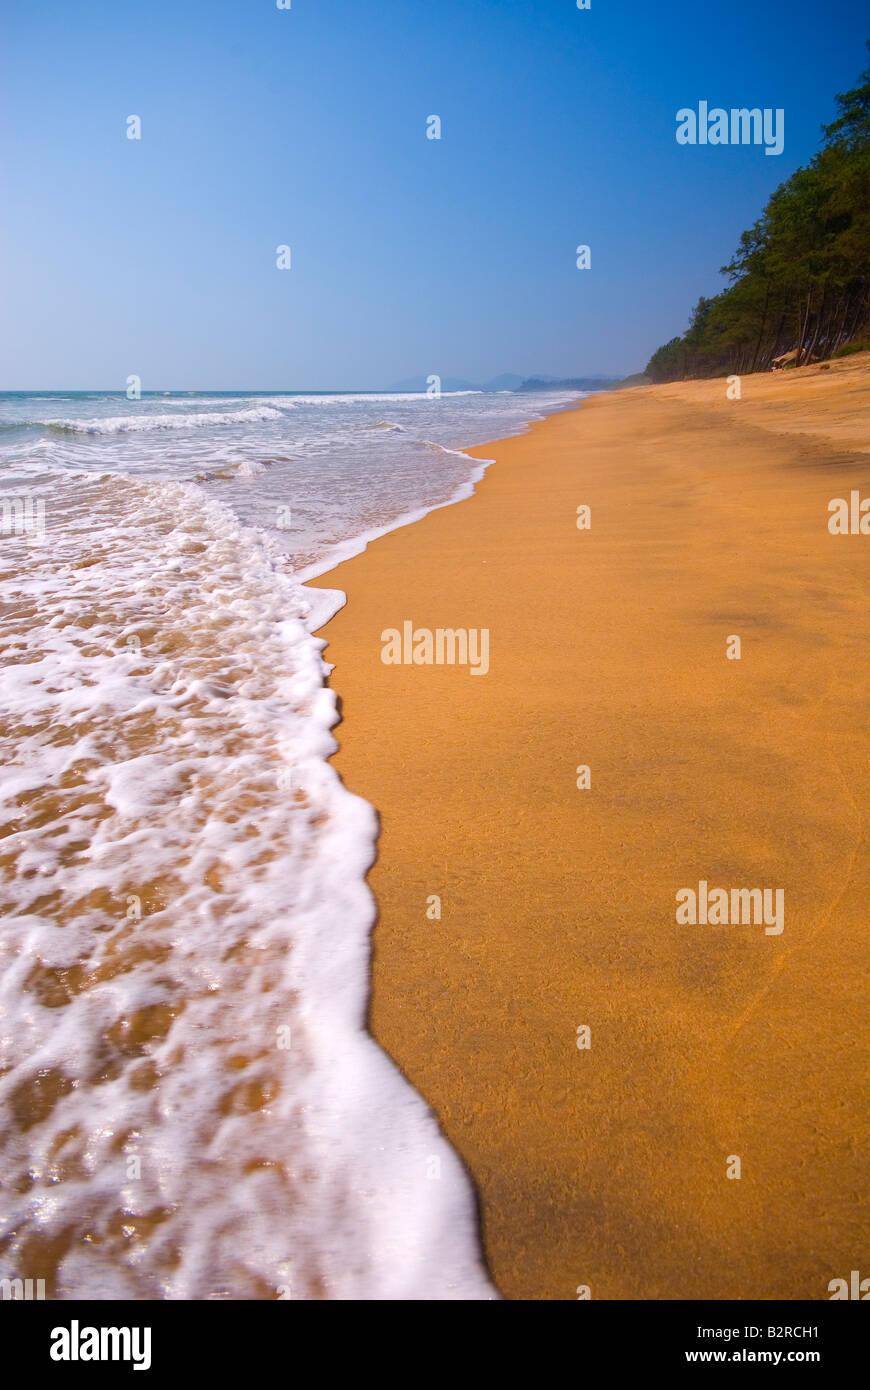 Canacona Beach, Goa, India, Subcontinent, Asia - Stock Image